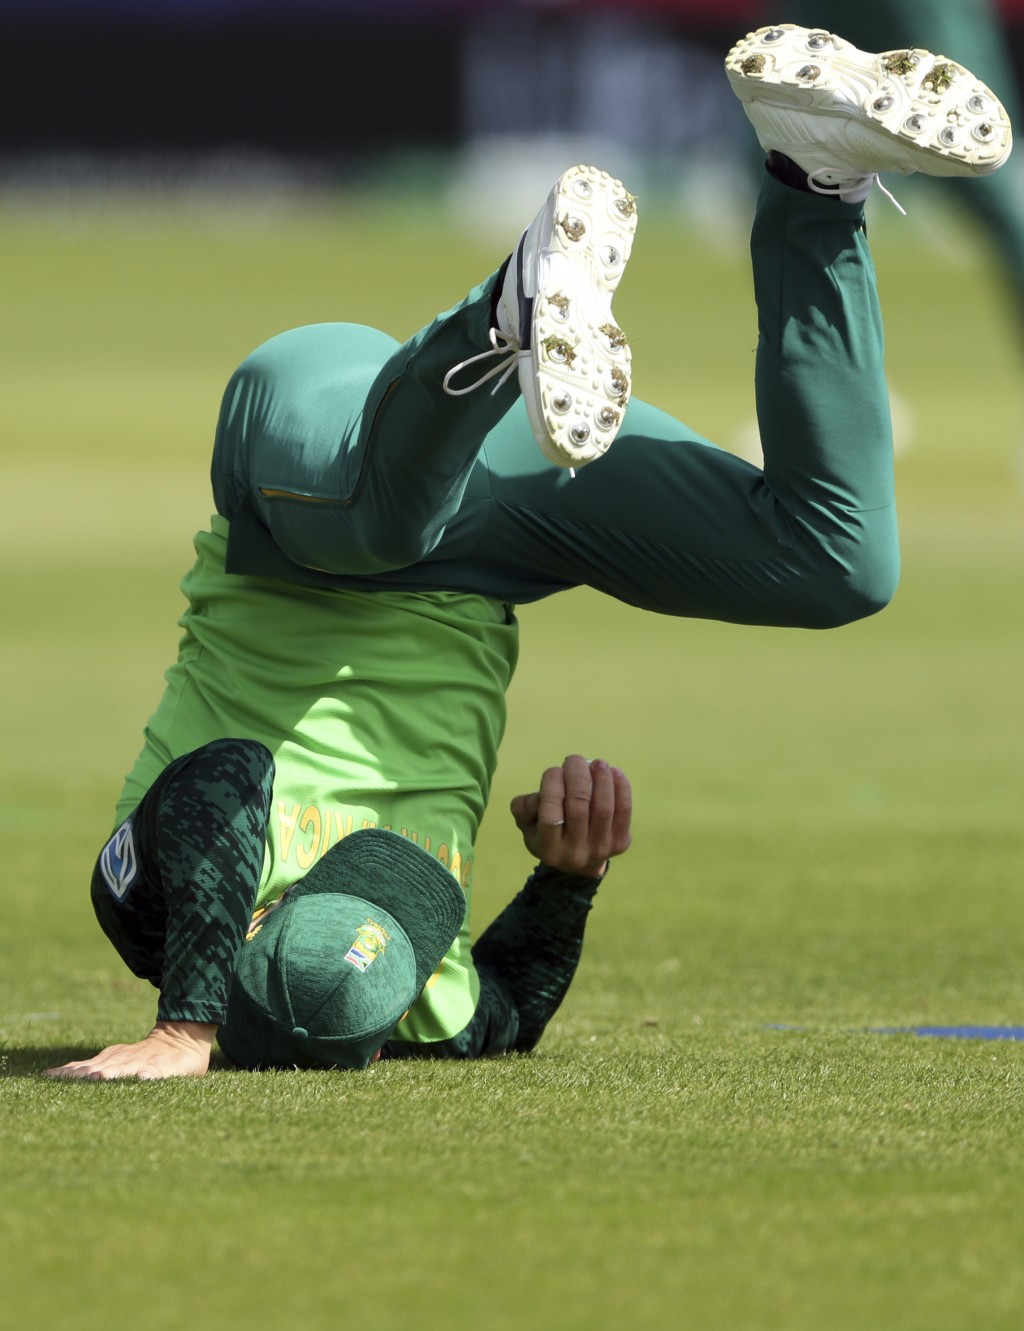 South Africa's captain Faf du Plessis falls on the ground after taking a catch to dismiss Sri Lanka's batsman Avishka Fernando for 30 runs during the ...